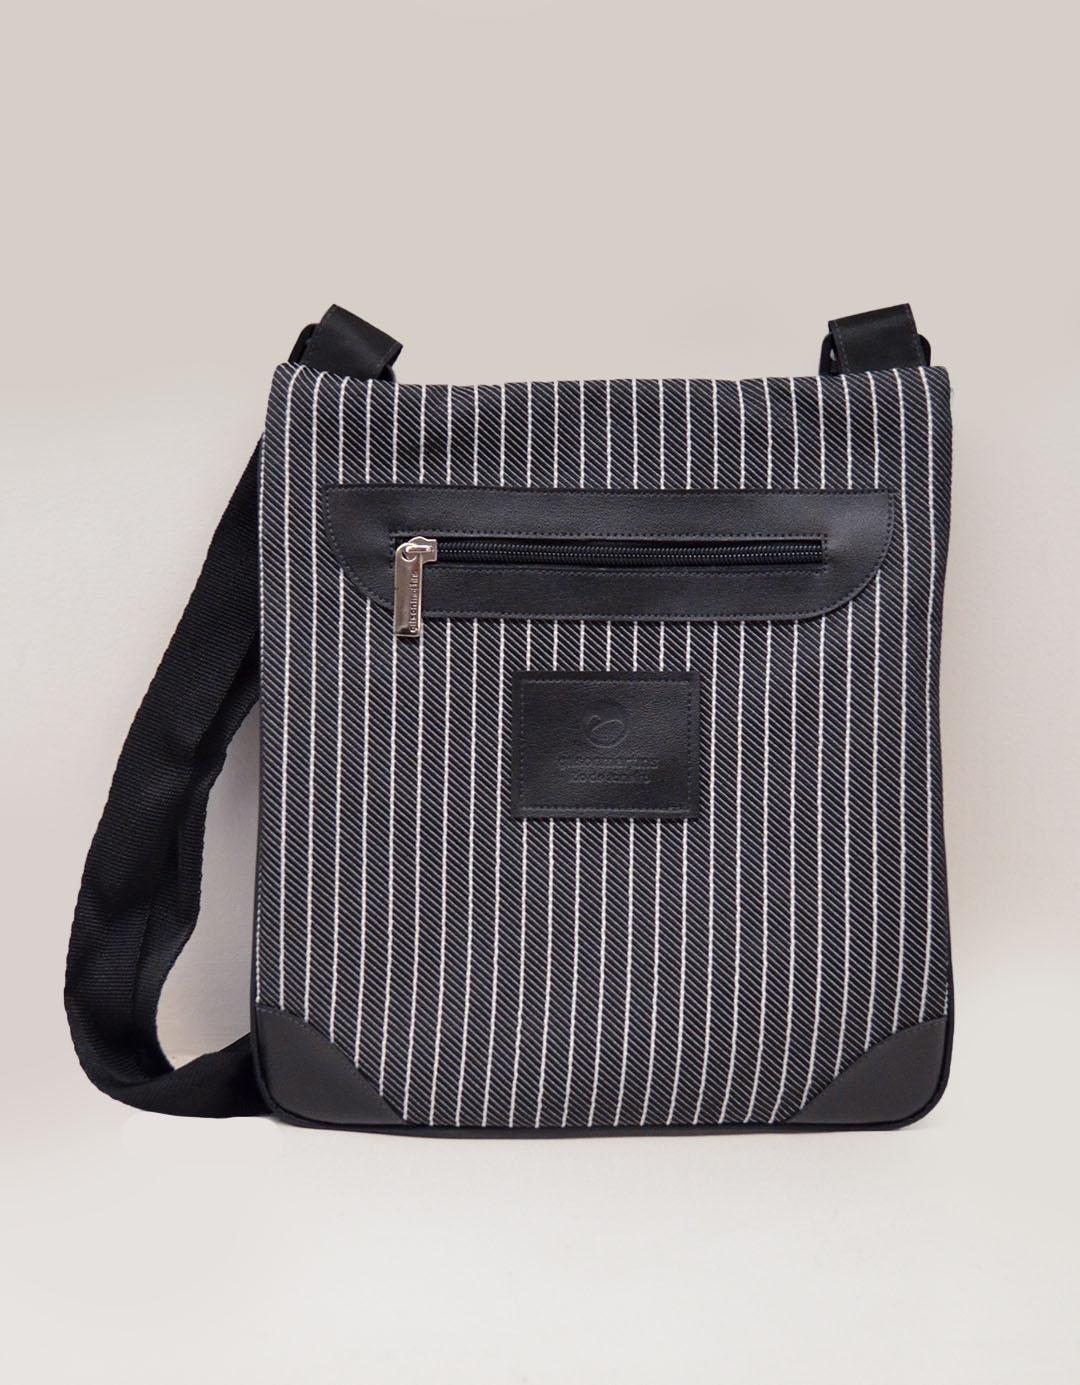 Bolsa Transversal Risca de Giz Cross Bag Carlo